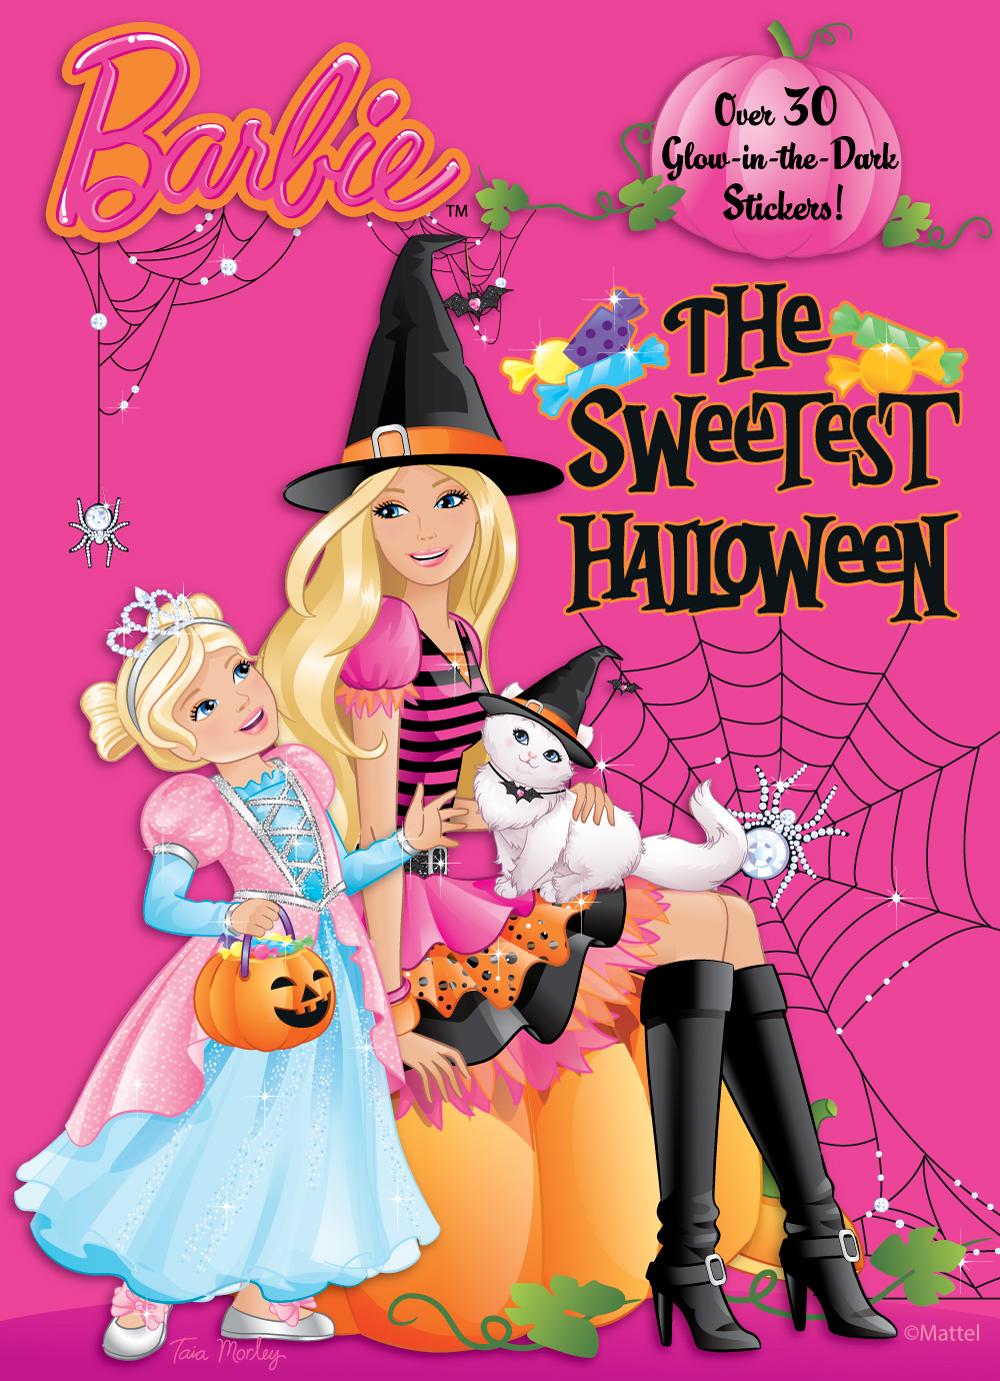 SweetestHalloween_SS.jpg